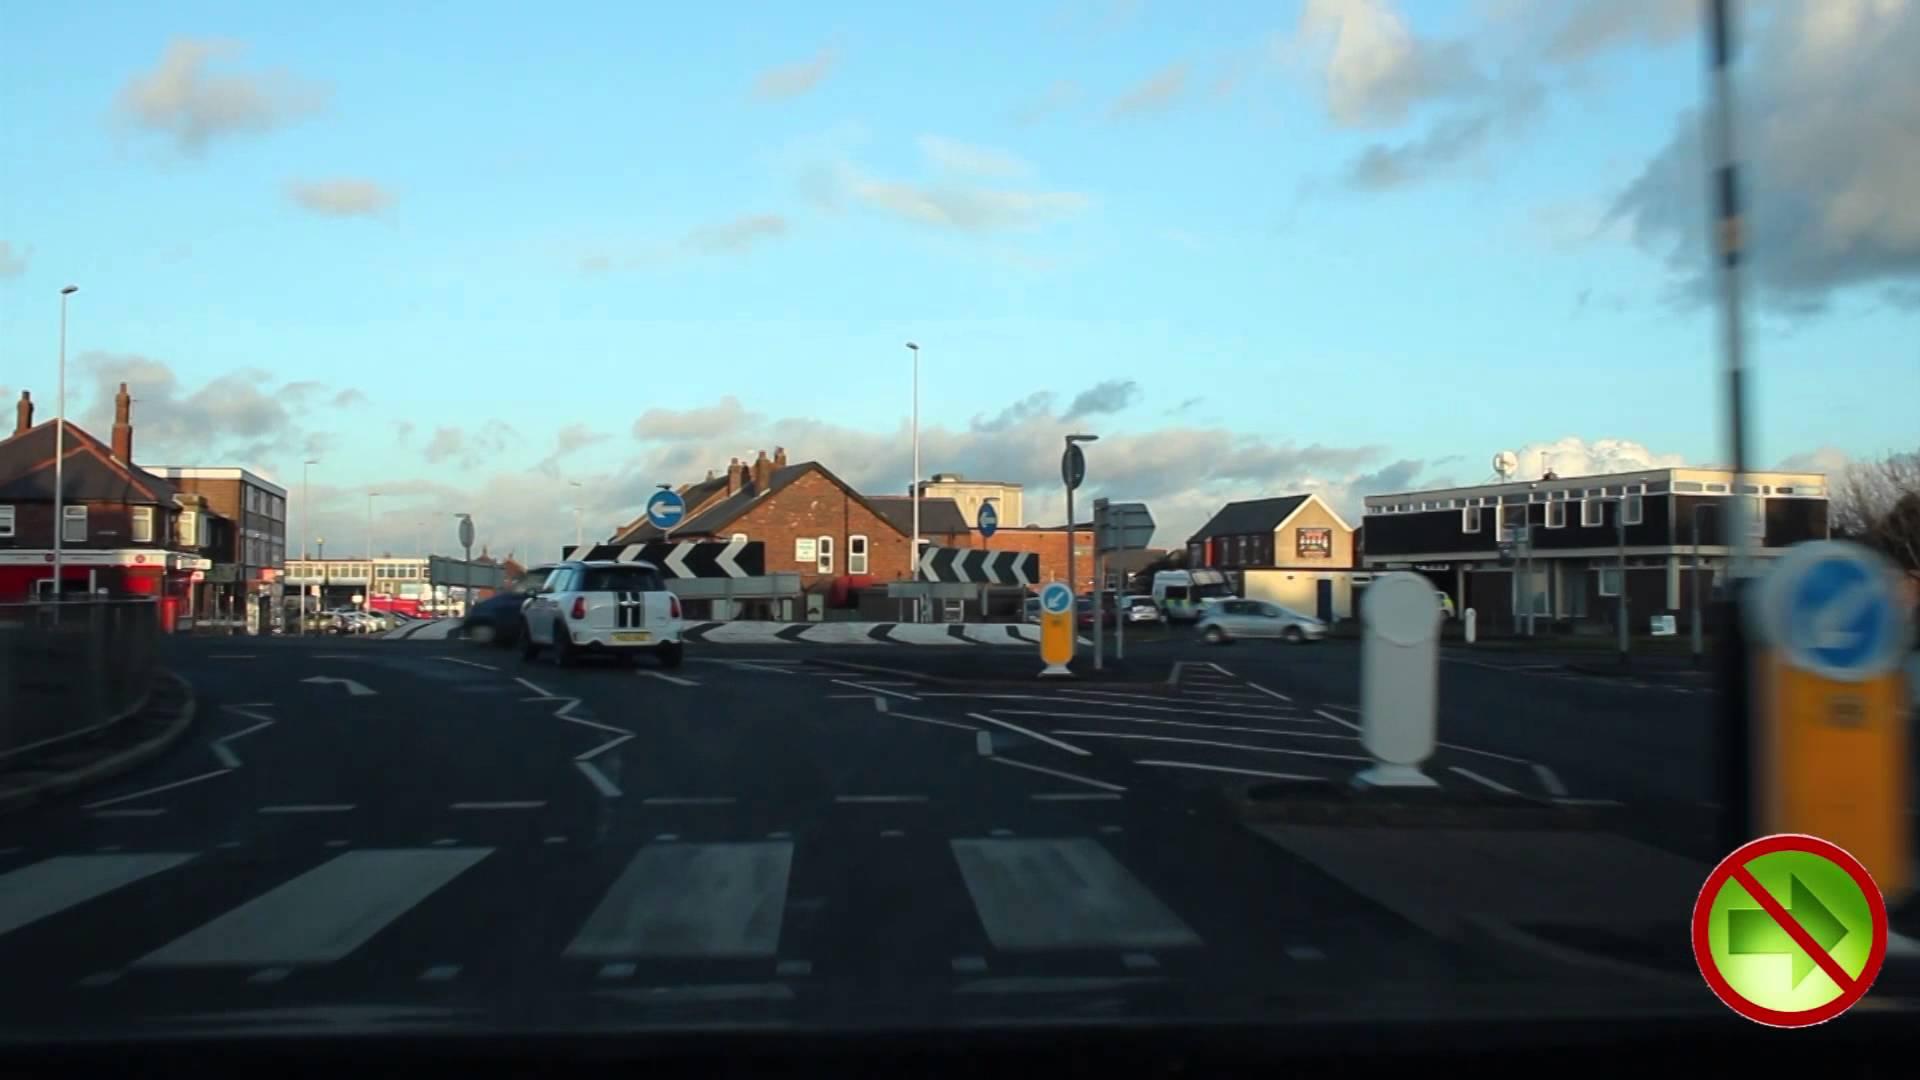 Bispham roundabout